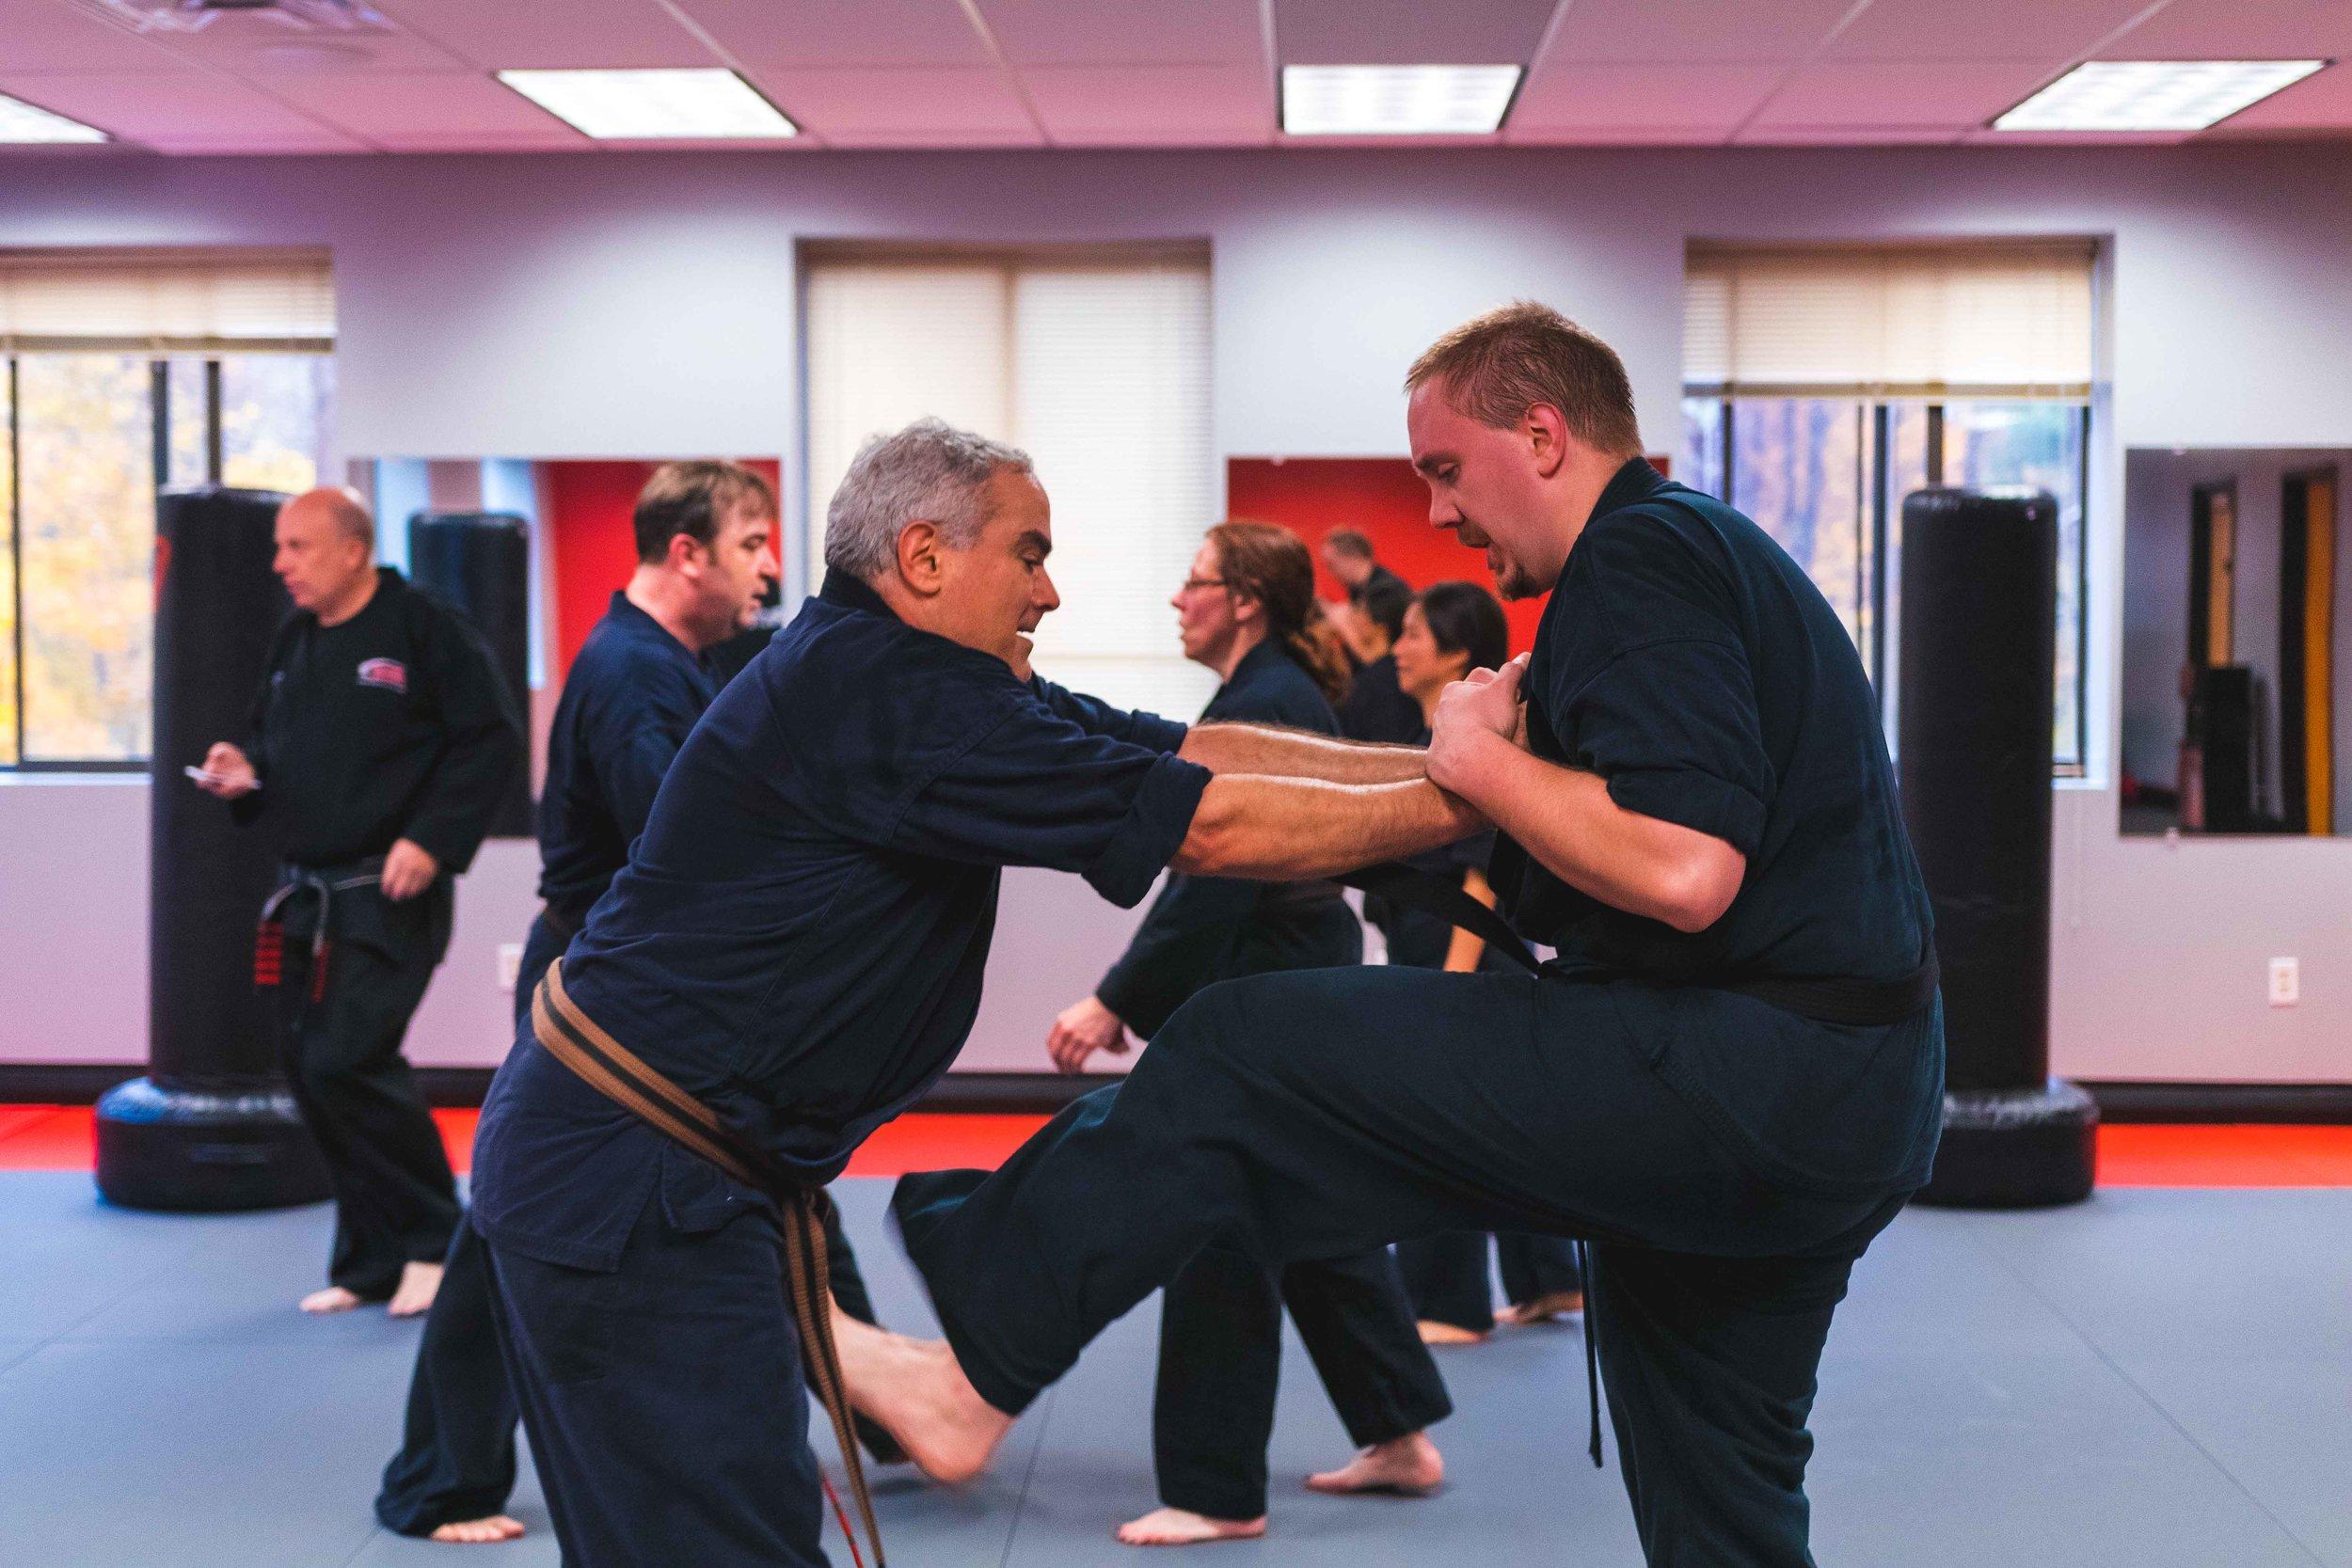 Beginner Martial Arts Classes for Adult Men and Women in Bedford Massachusetts at Callahan's Karate.jpg